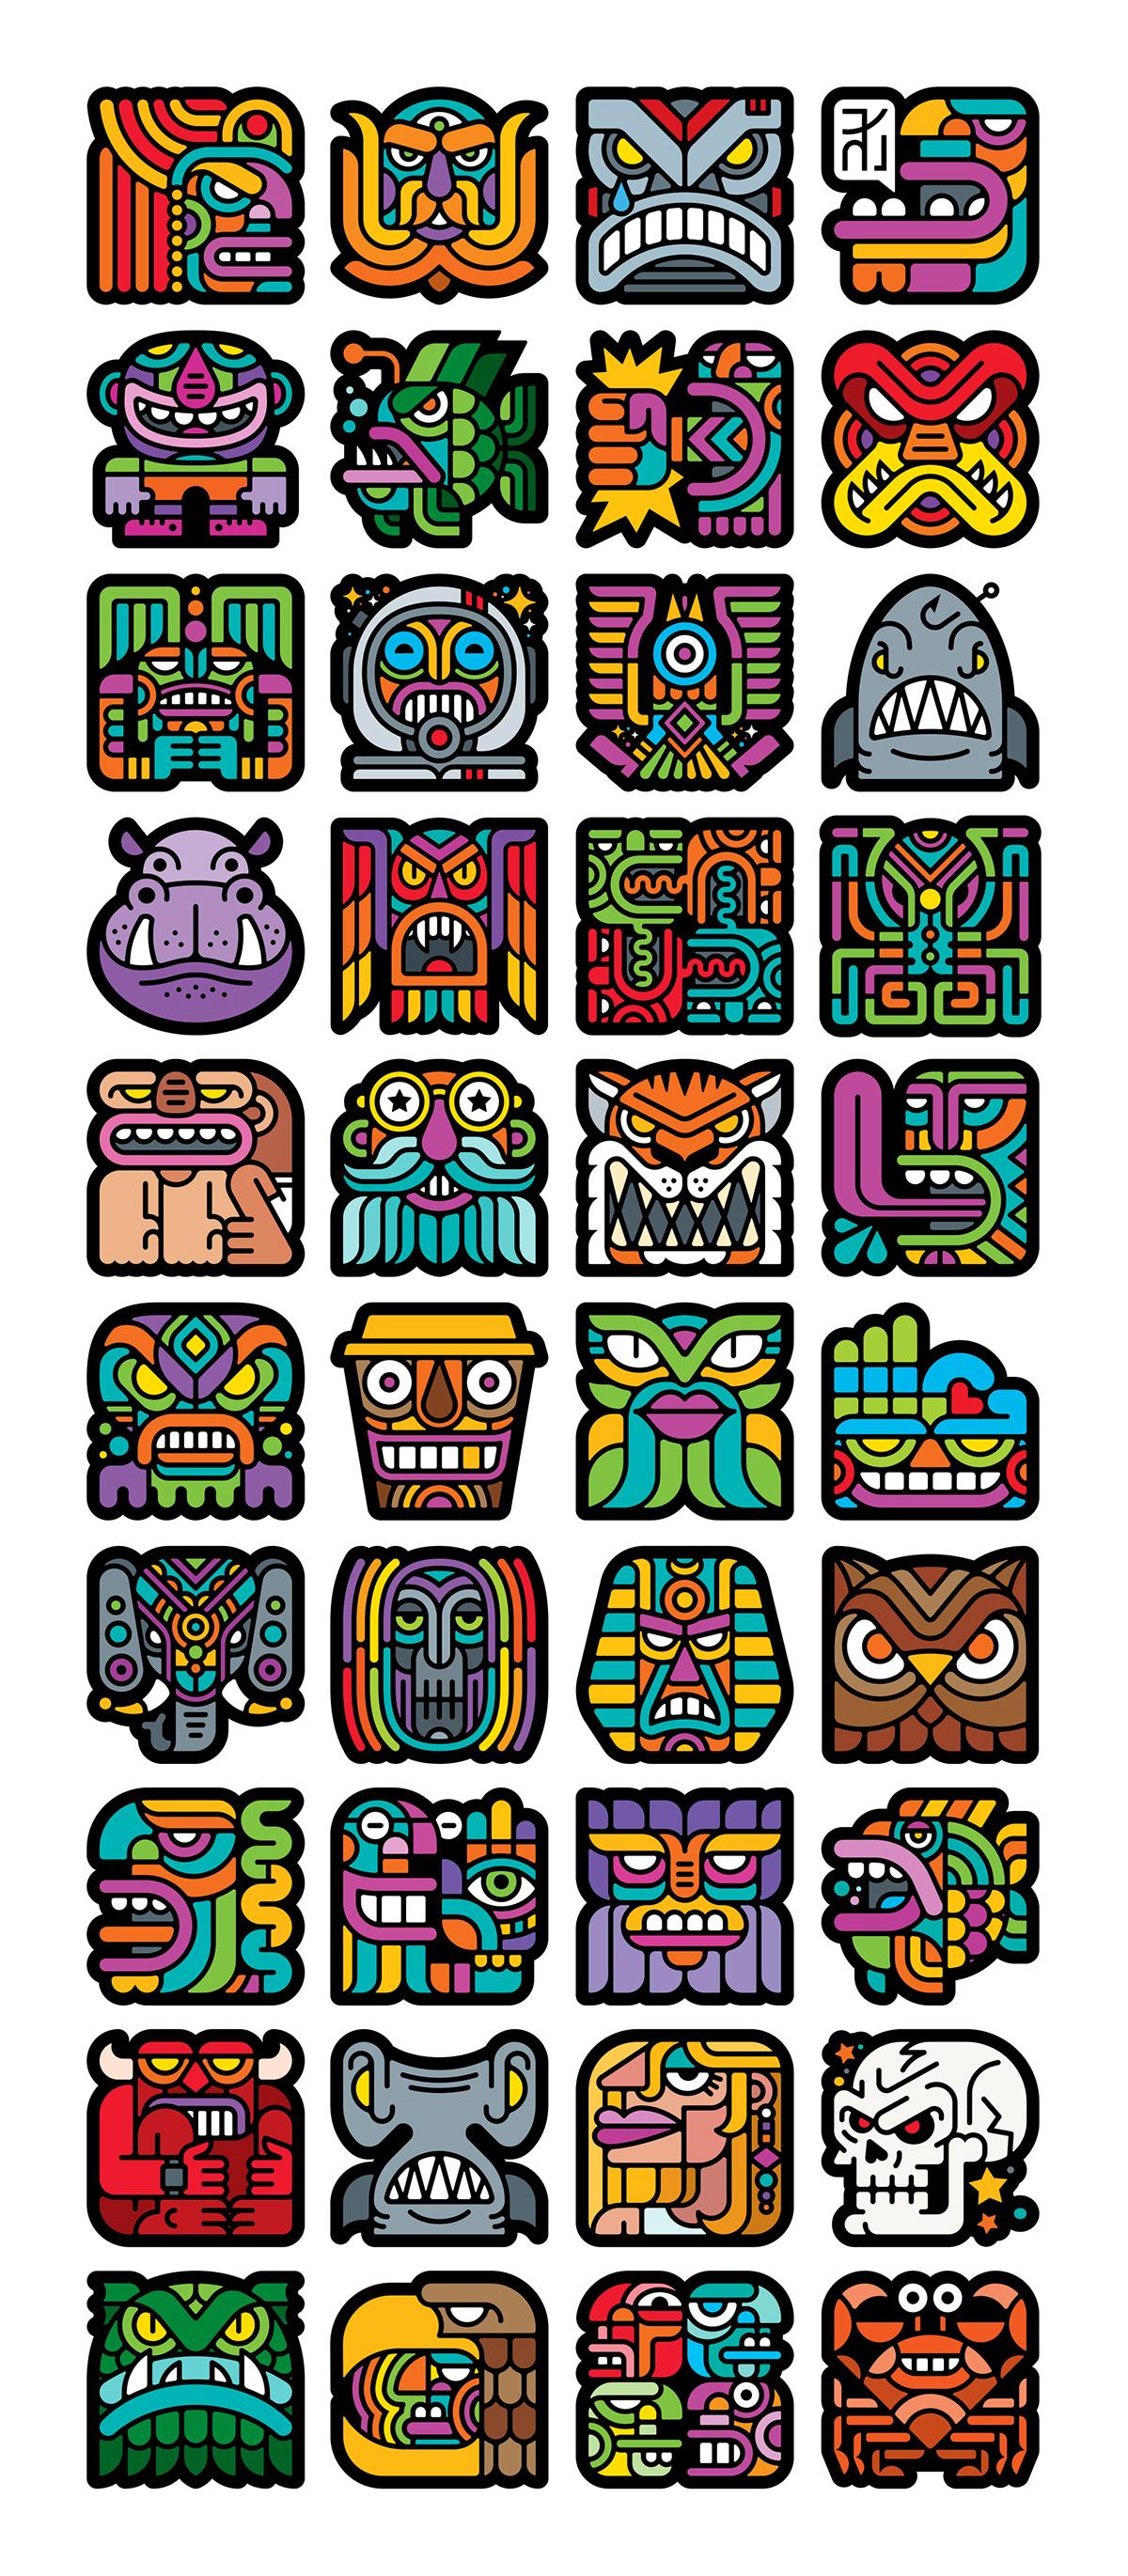 adobe illustrator art Collection creative creative process design ILLUSTRATION  Modern Kulture Square Shaped timelapse